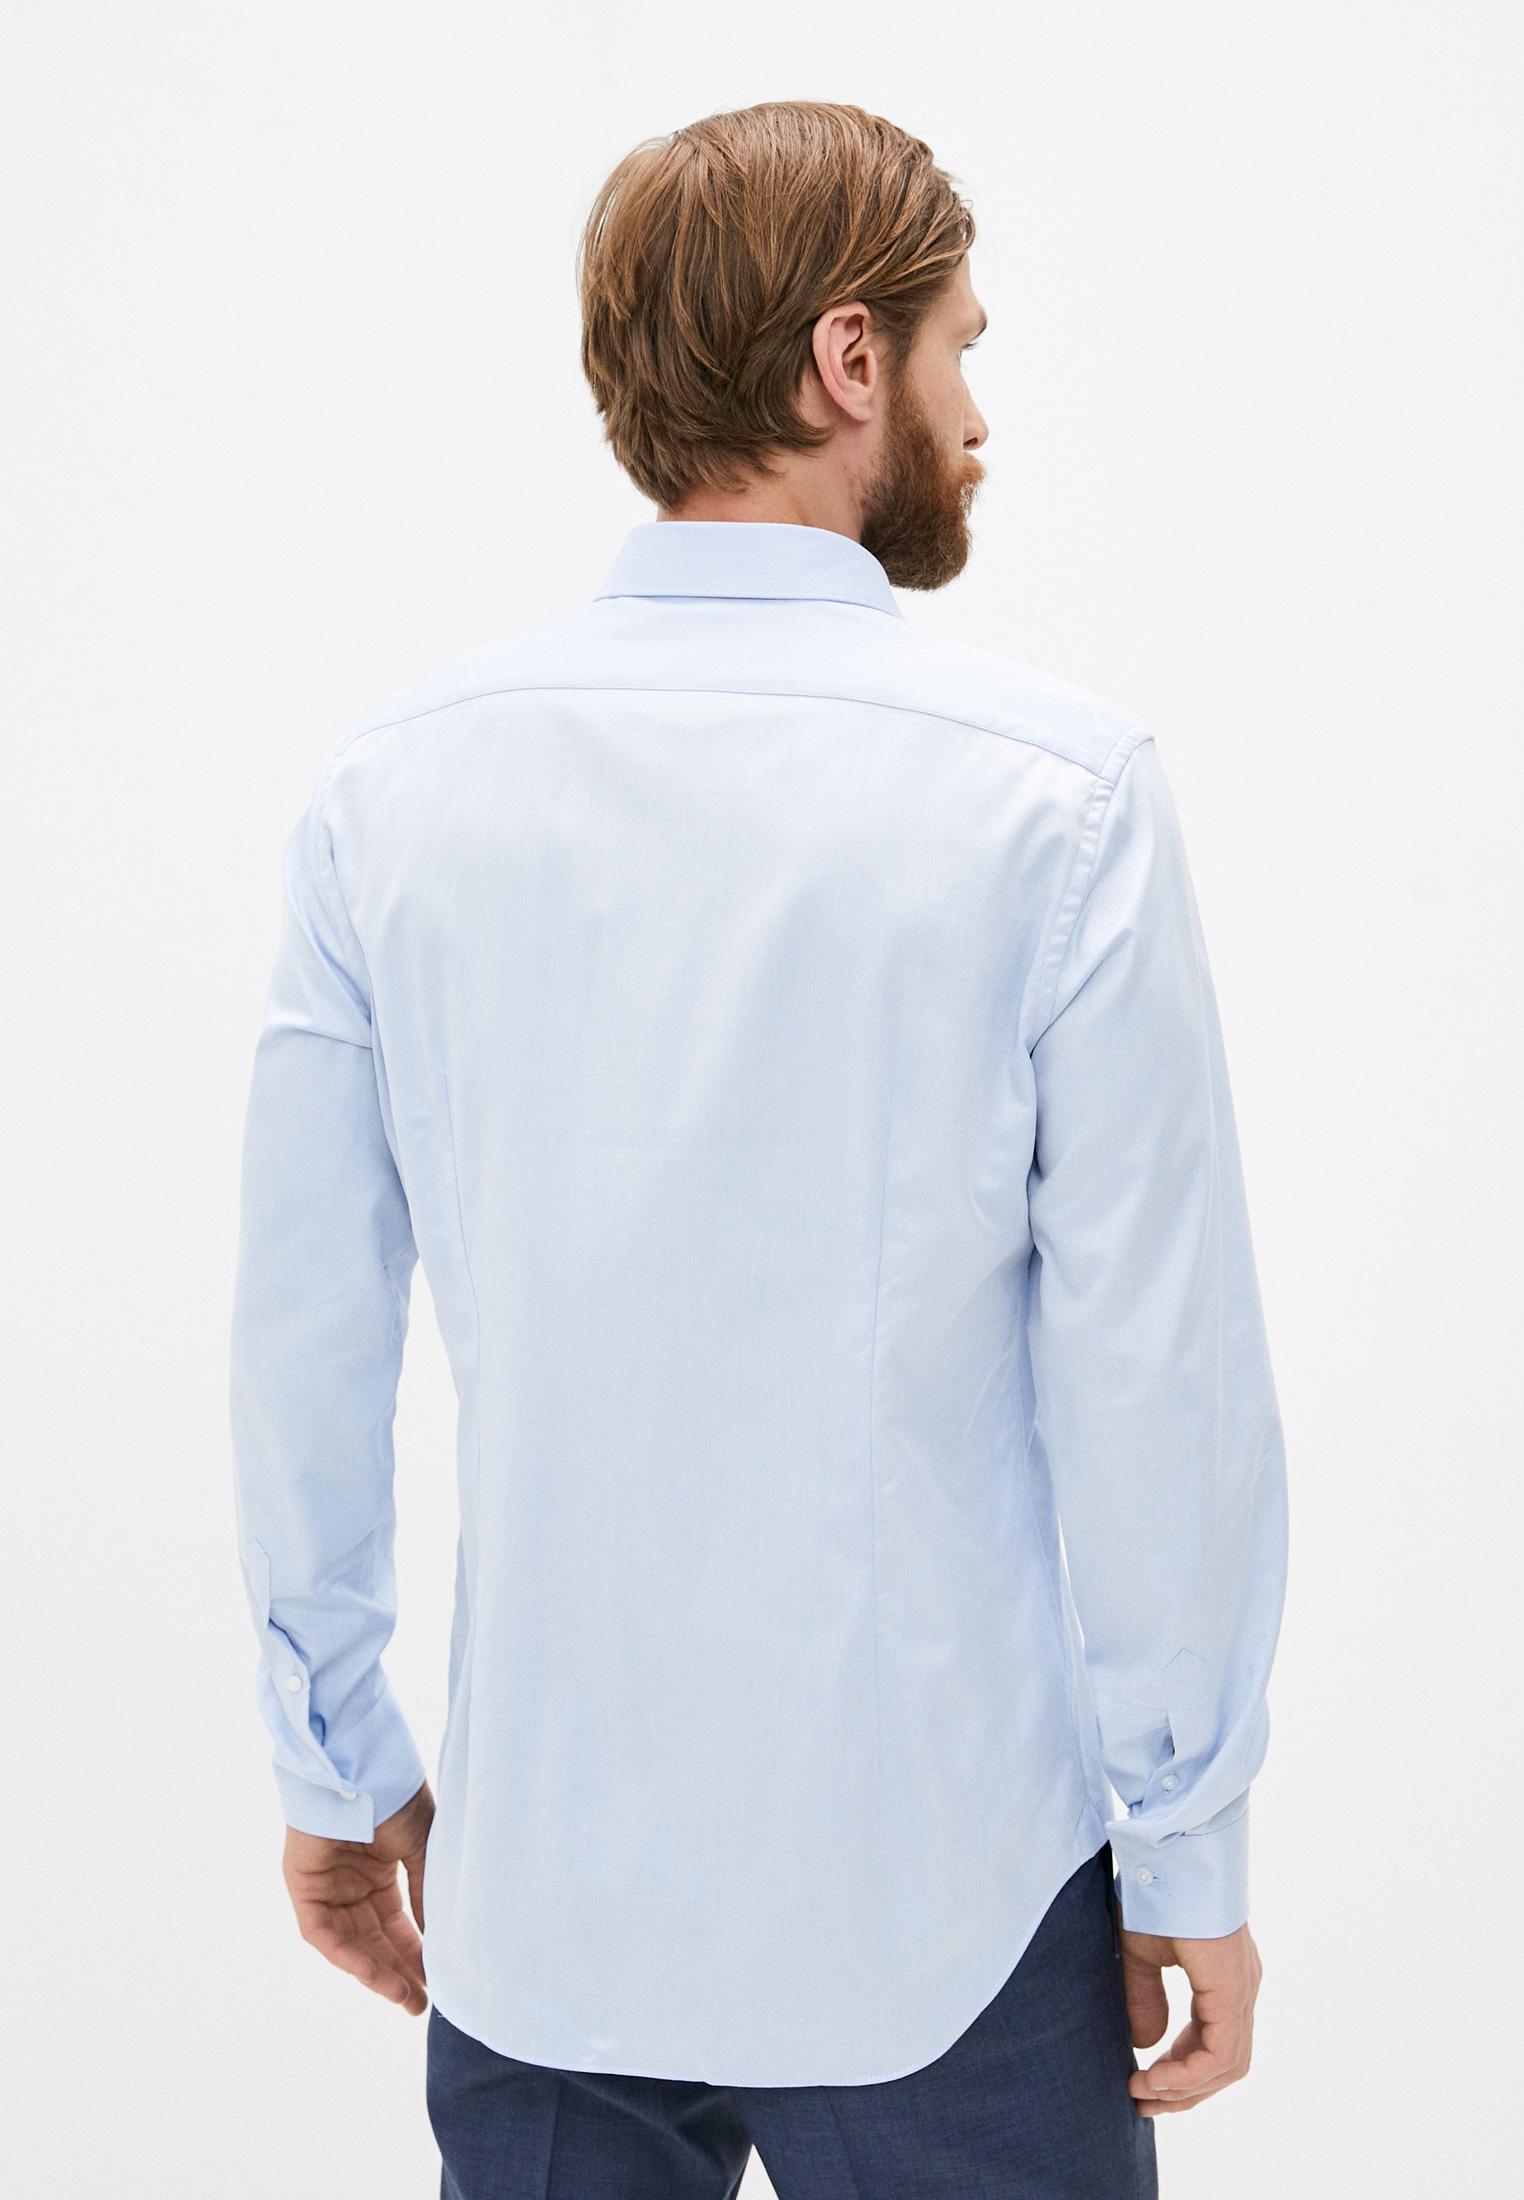 Рубашка с длинным рукавом CC Collection Corneliani 87px81-1161211: изображение 4